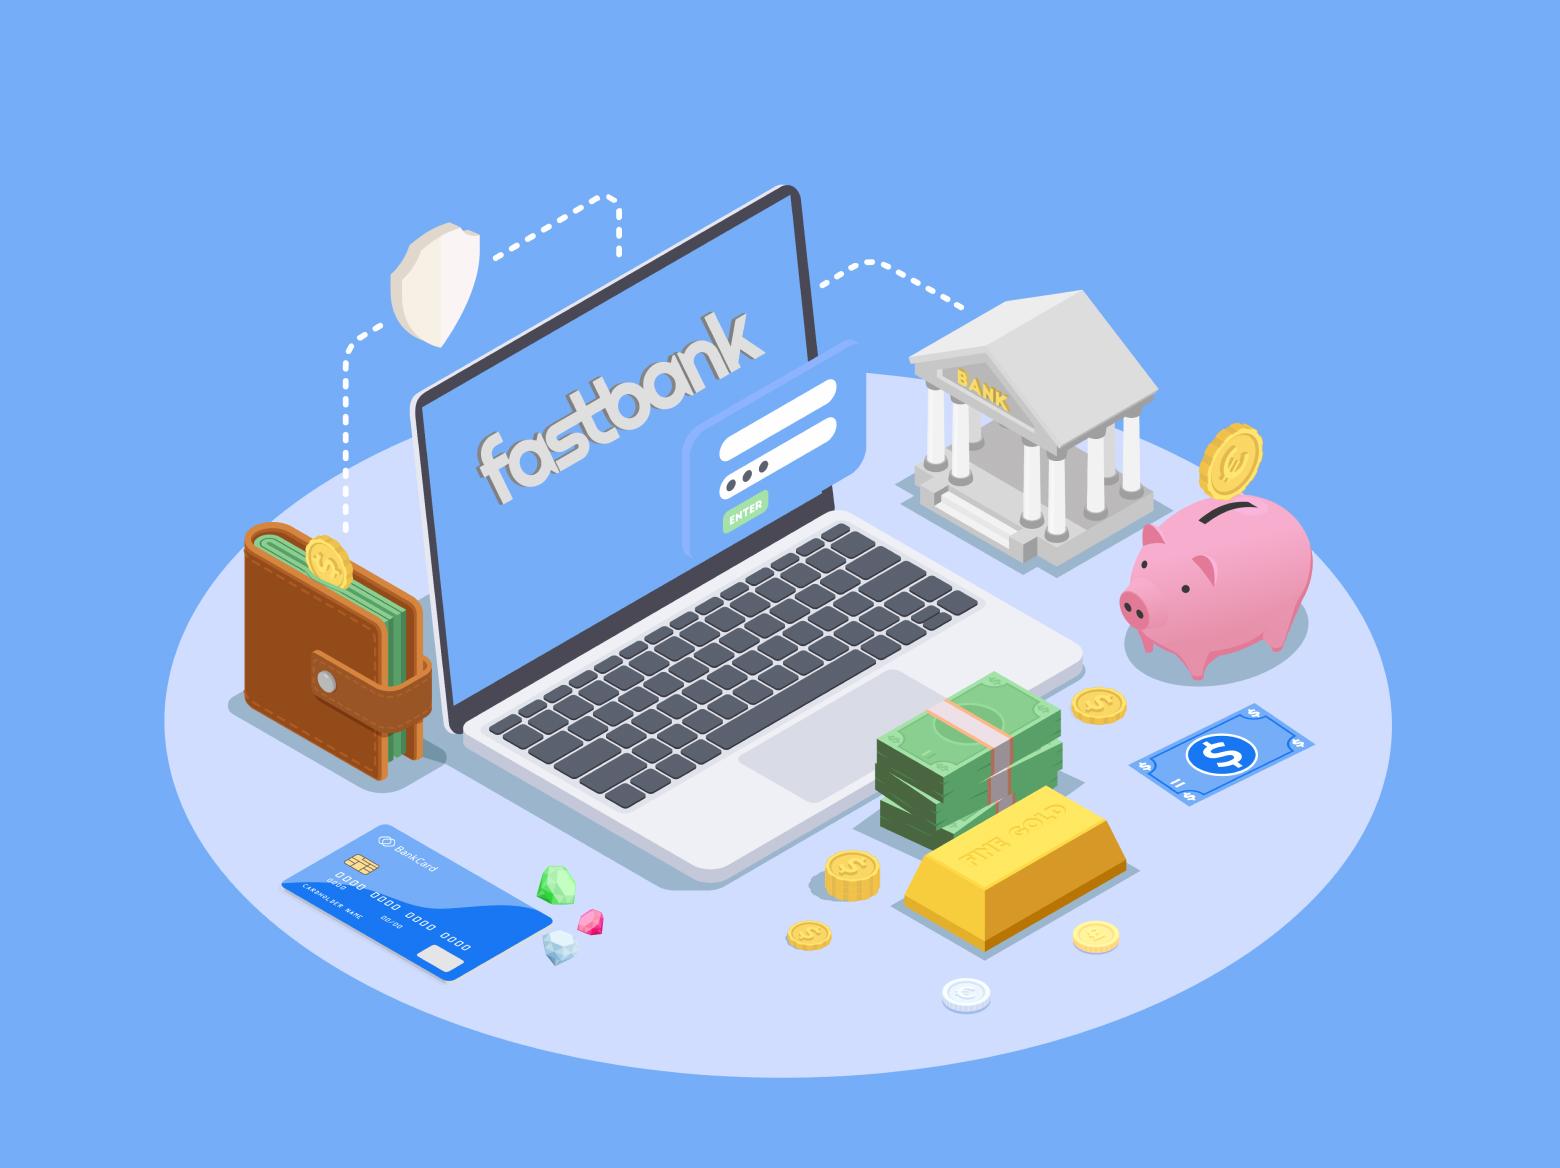 Fastbank – Digital Banking Solution